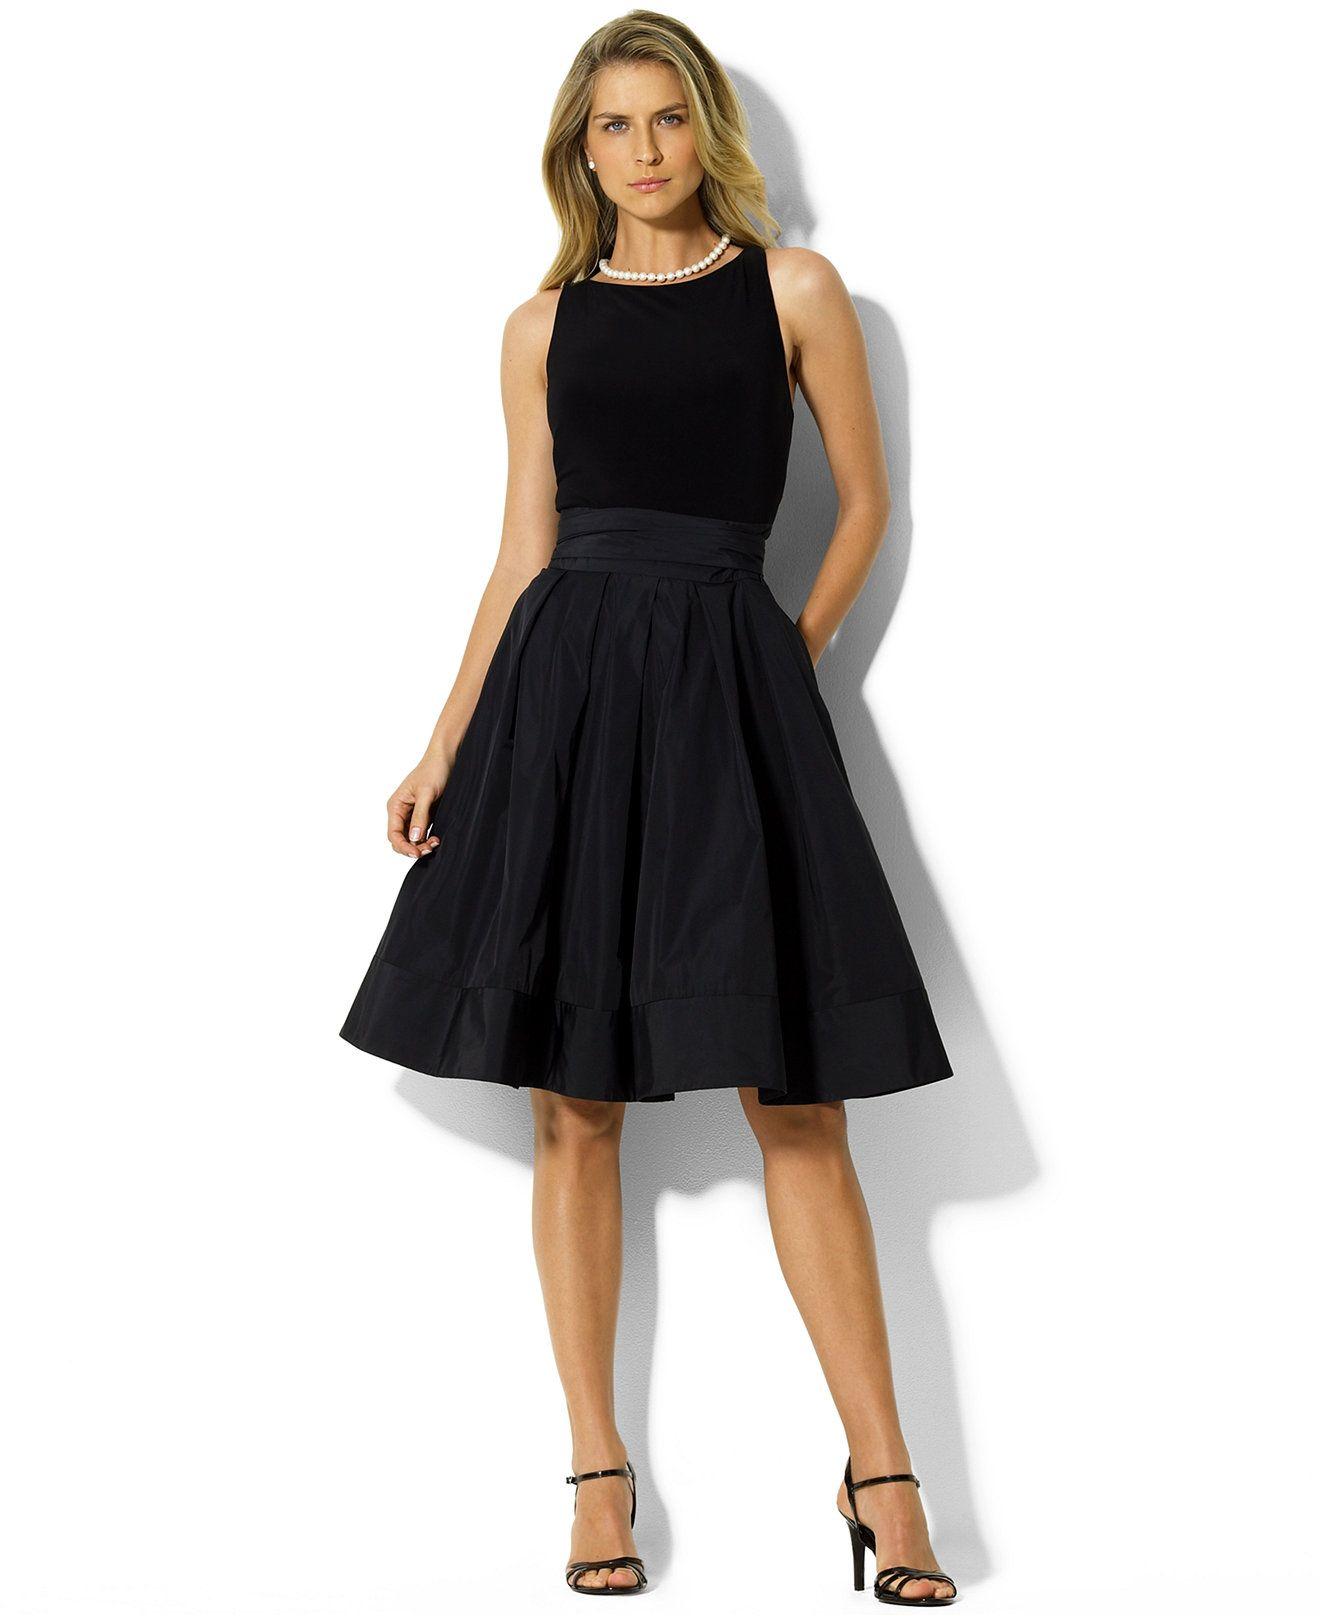 270ec5a73fcc6 Lauren Ralph Lauren Pleated Cocktail Dress - Dresses - Women - Macy s